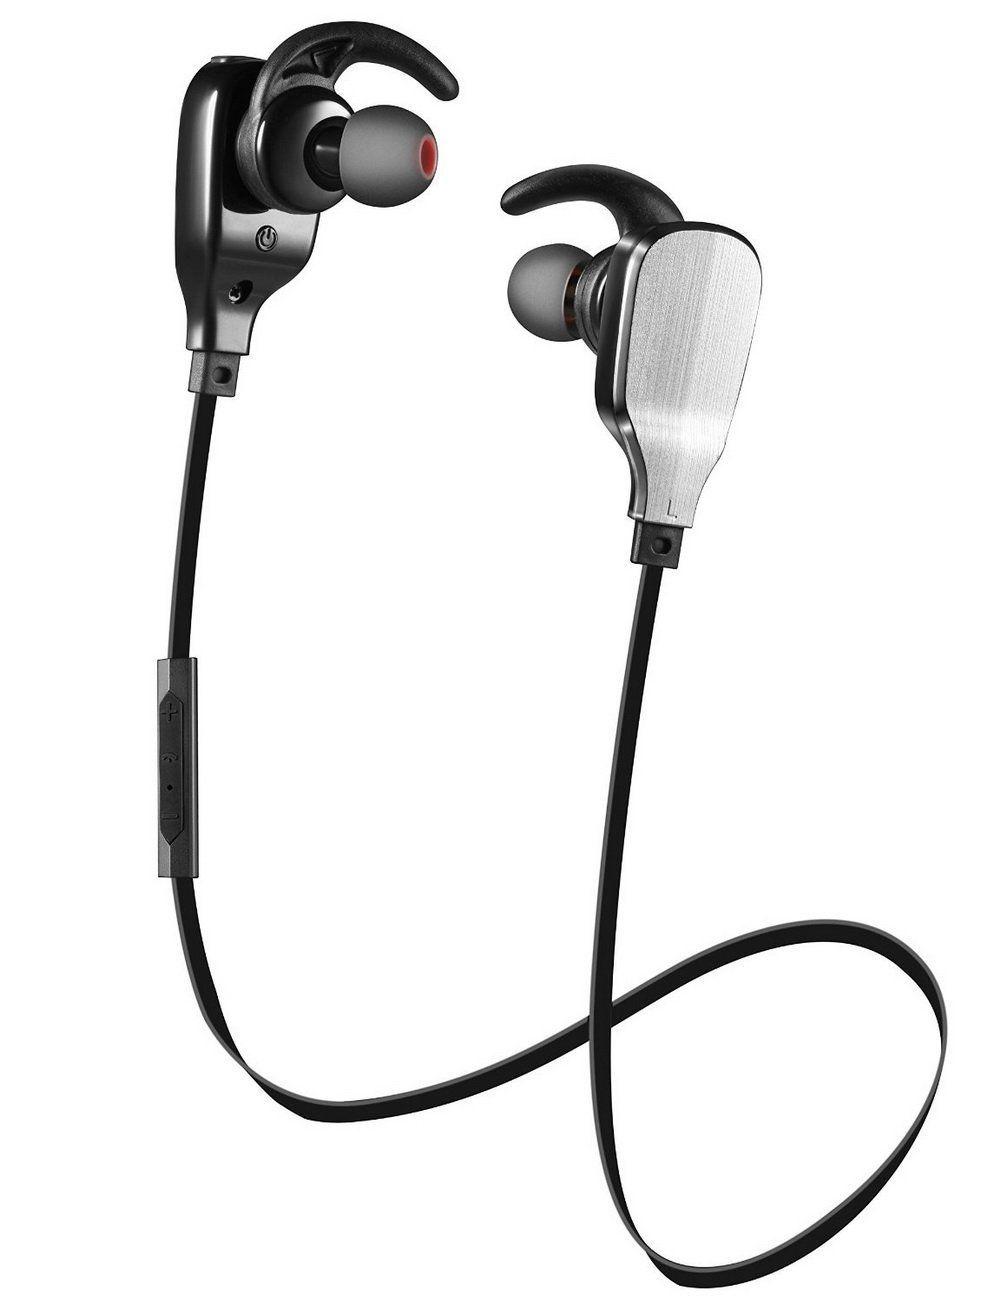 Ztotop Bluetooth Headset Wireless Sports 4.1 Lightweight HD